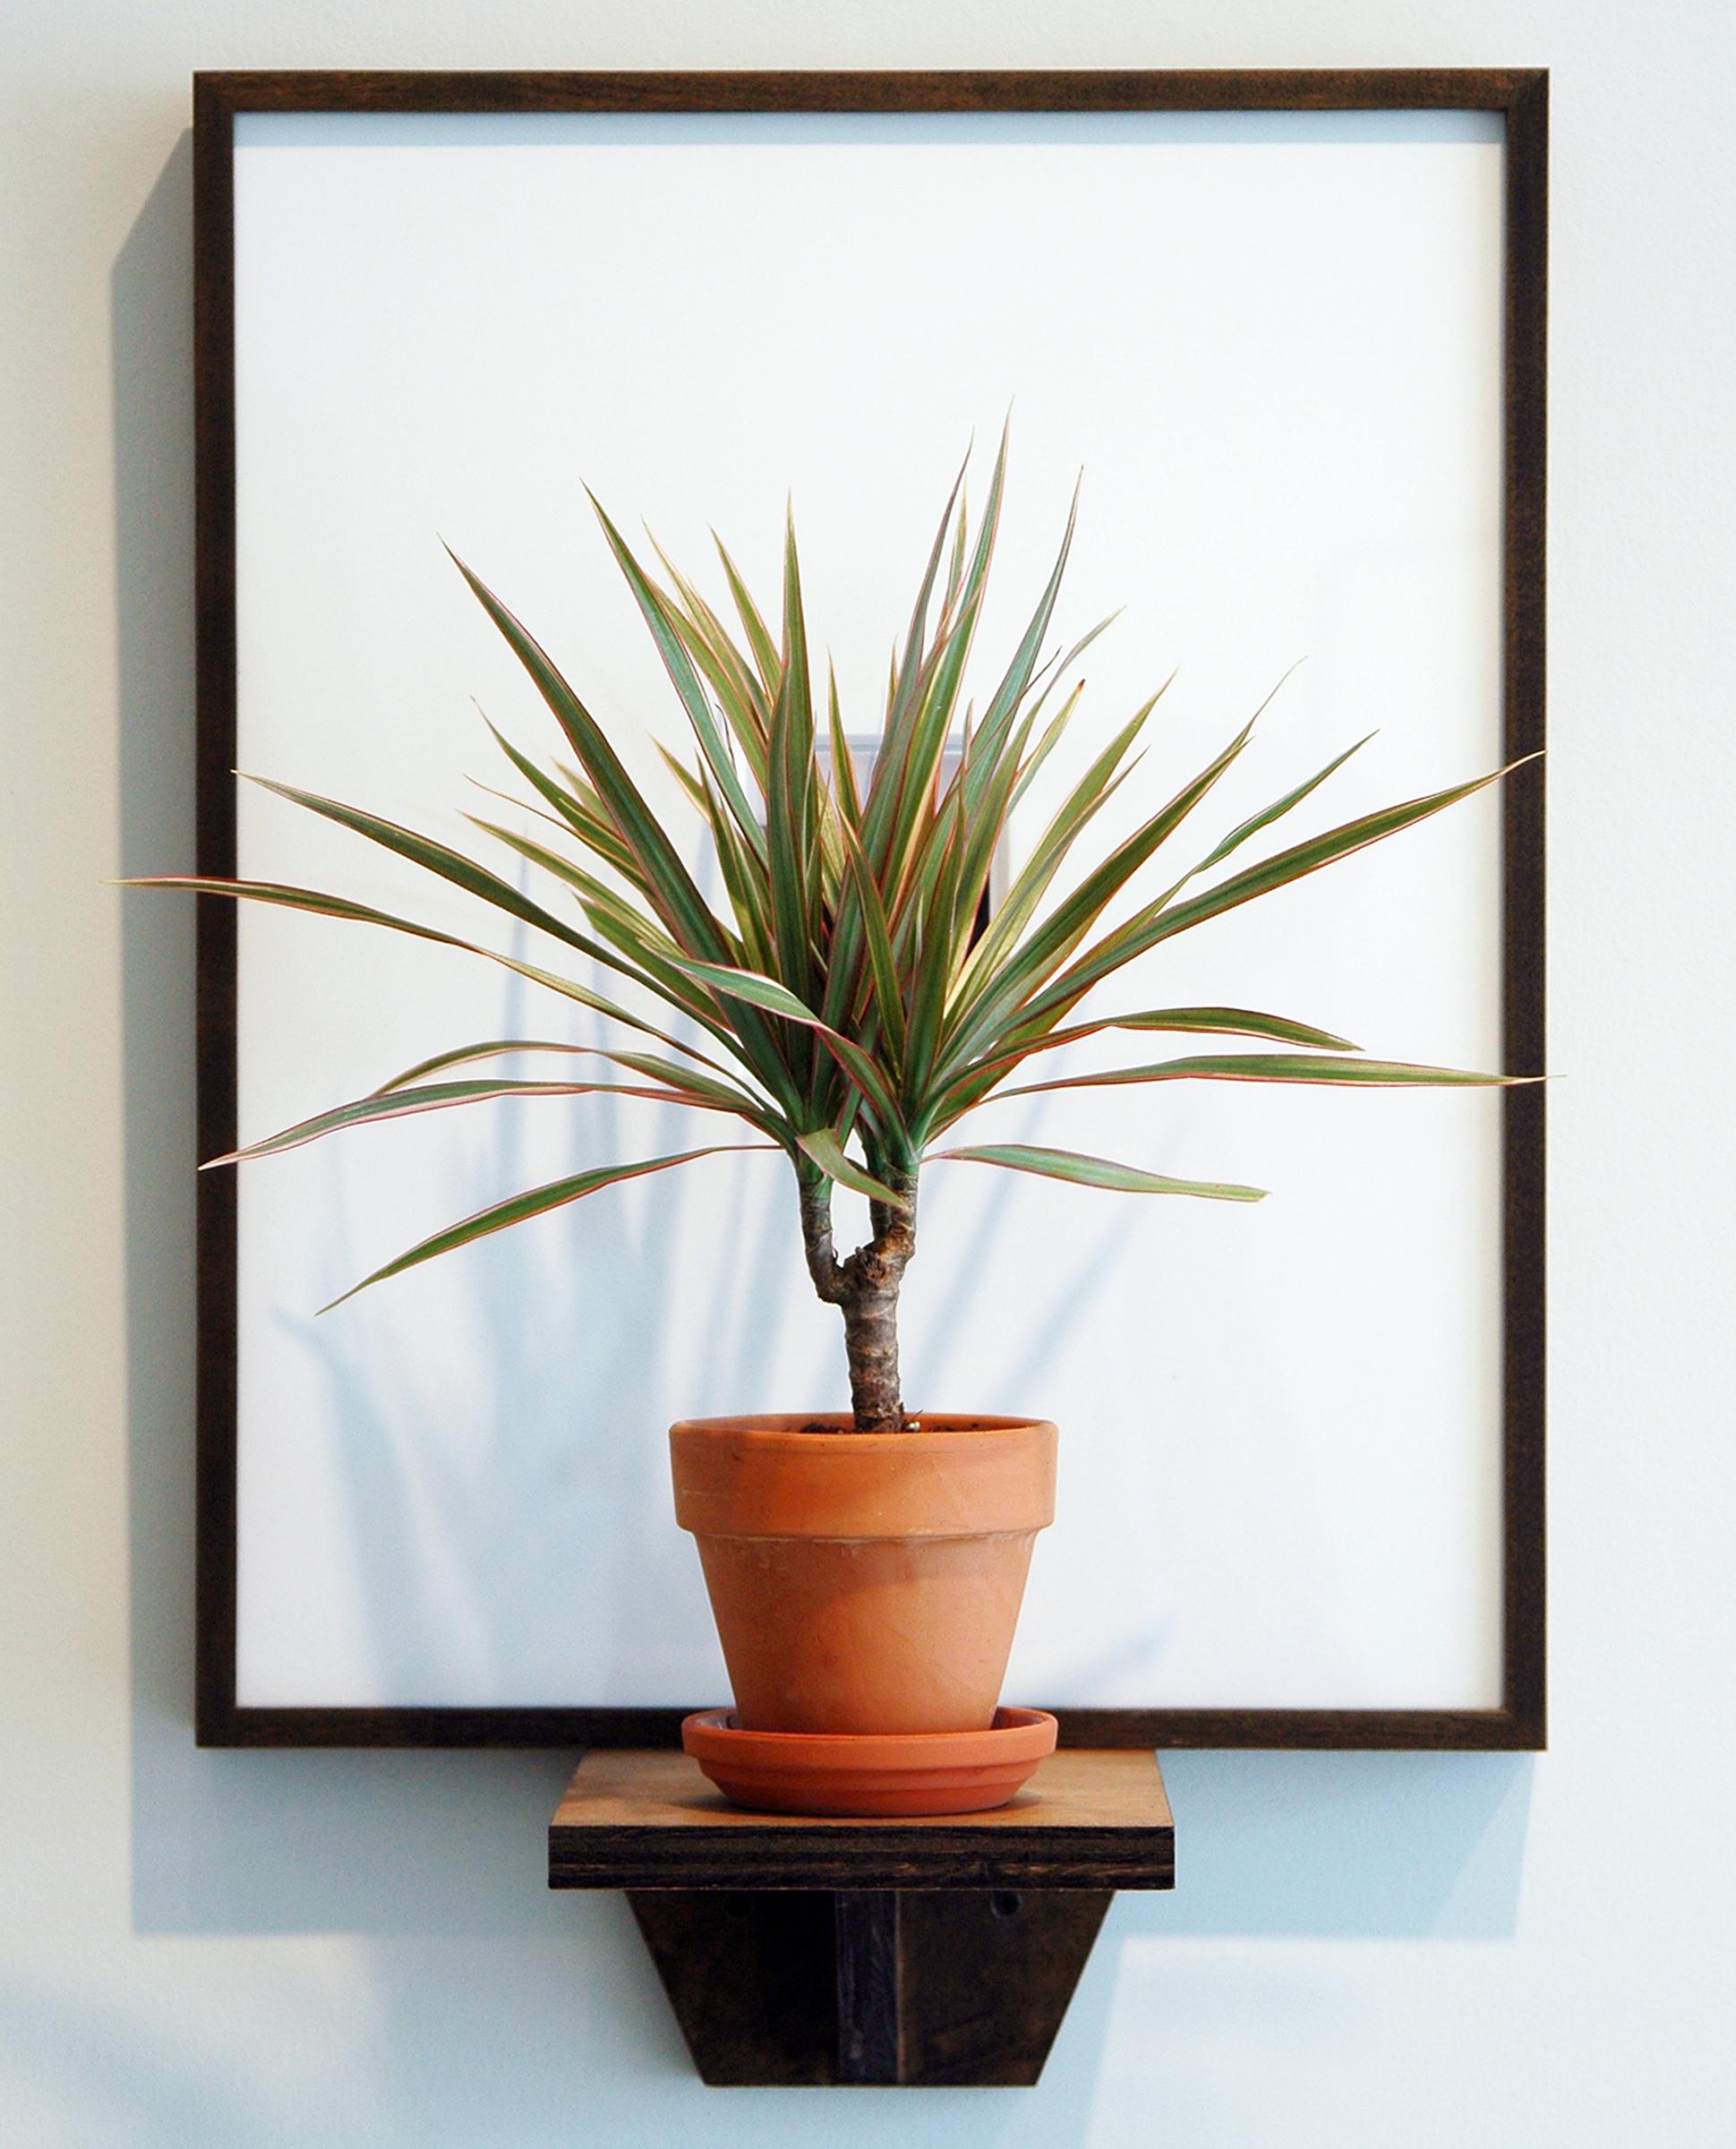 "JOSHUA PIEPER   Dead and Alive (George) , framed archival Polaroid, shelf, tri-colored dresena plant, 24.5"" x 16.25"" x 9.75"", 2012"